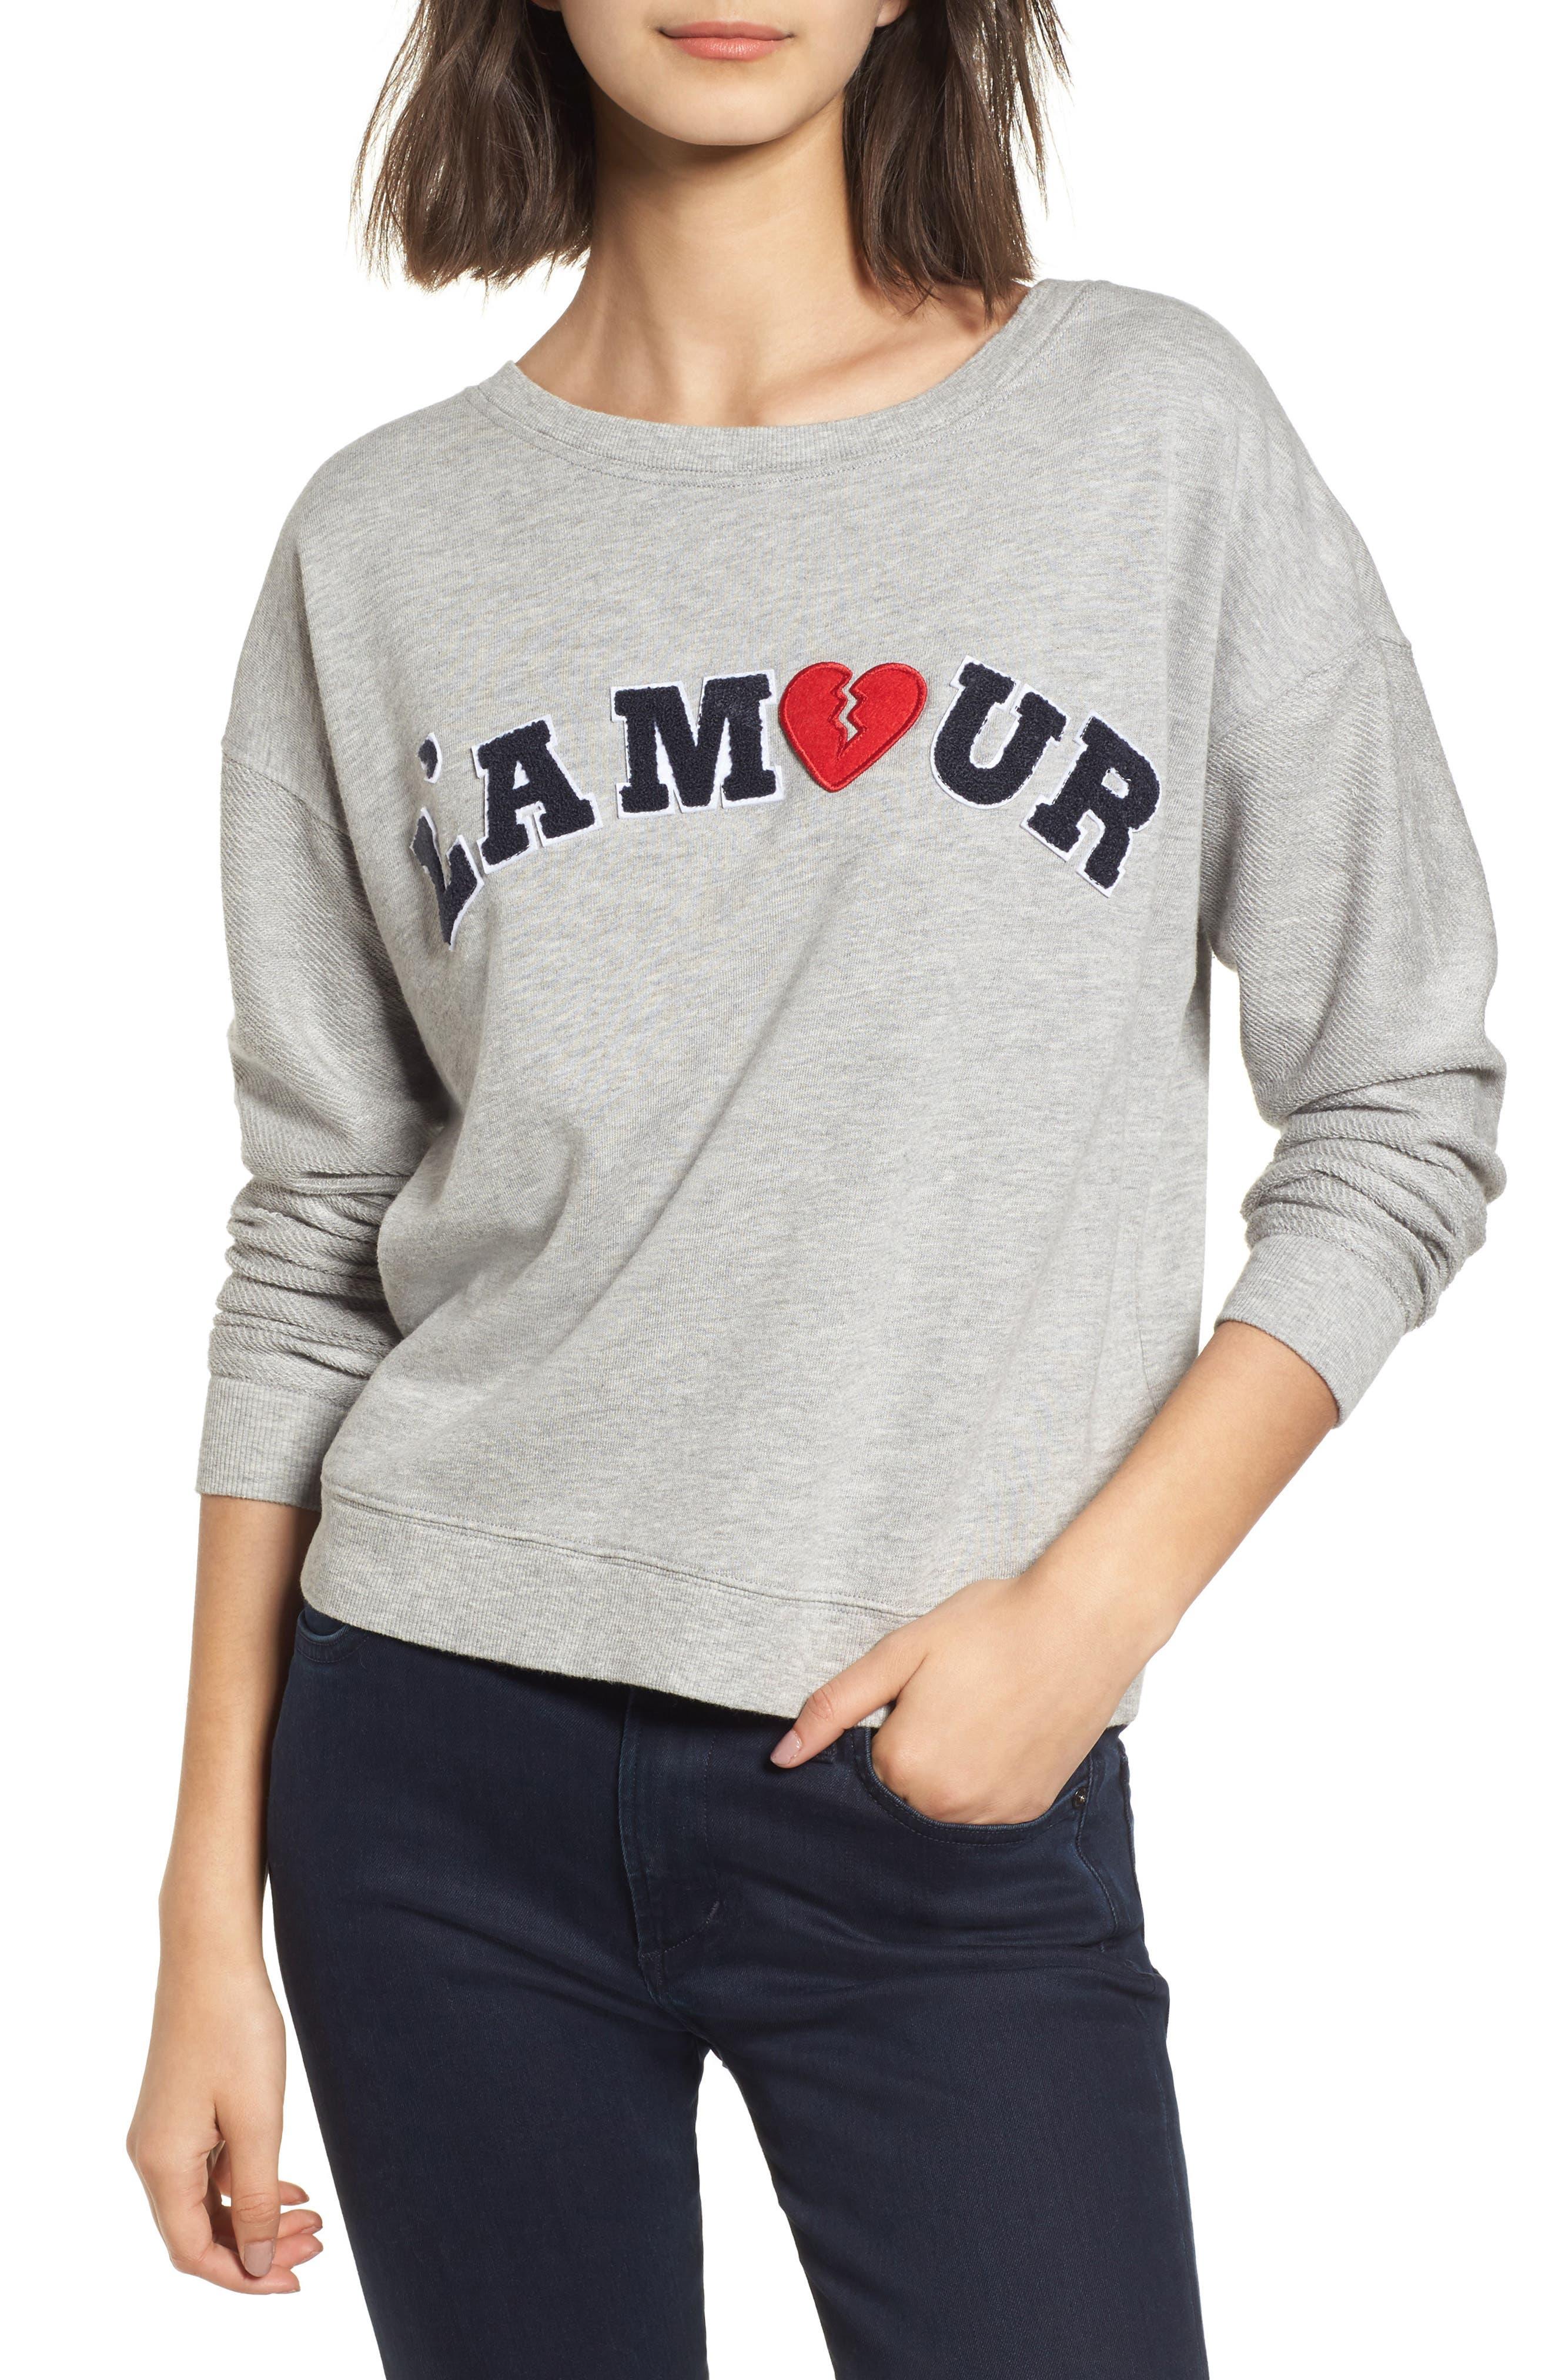 Kelli Paris Sweatshirt,                         Main,                         color, 032